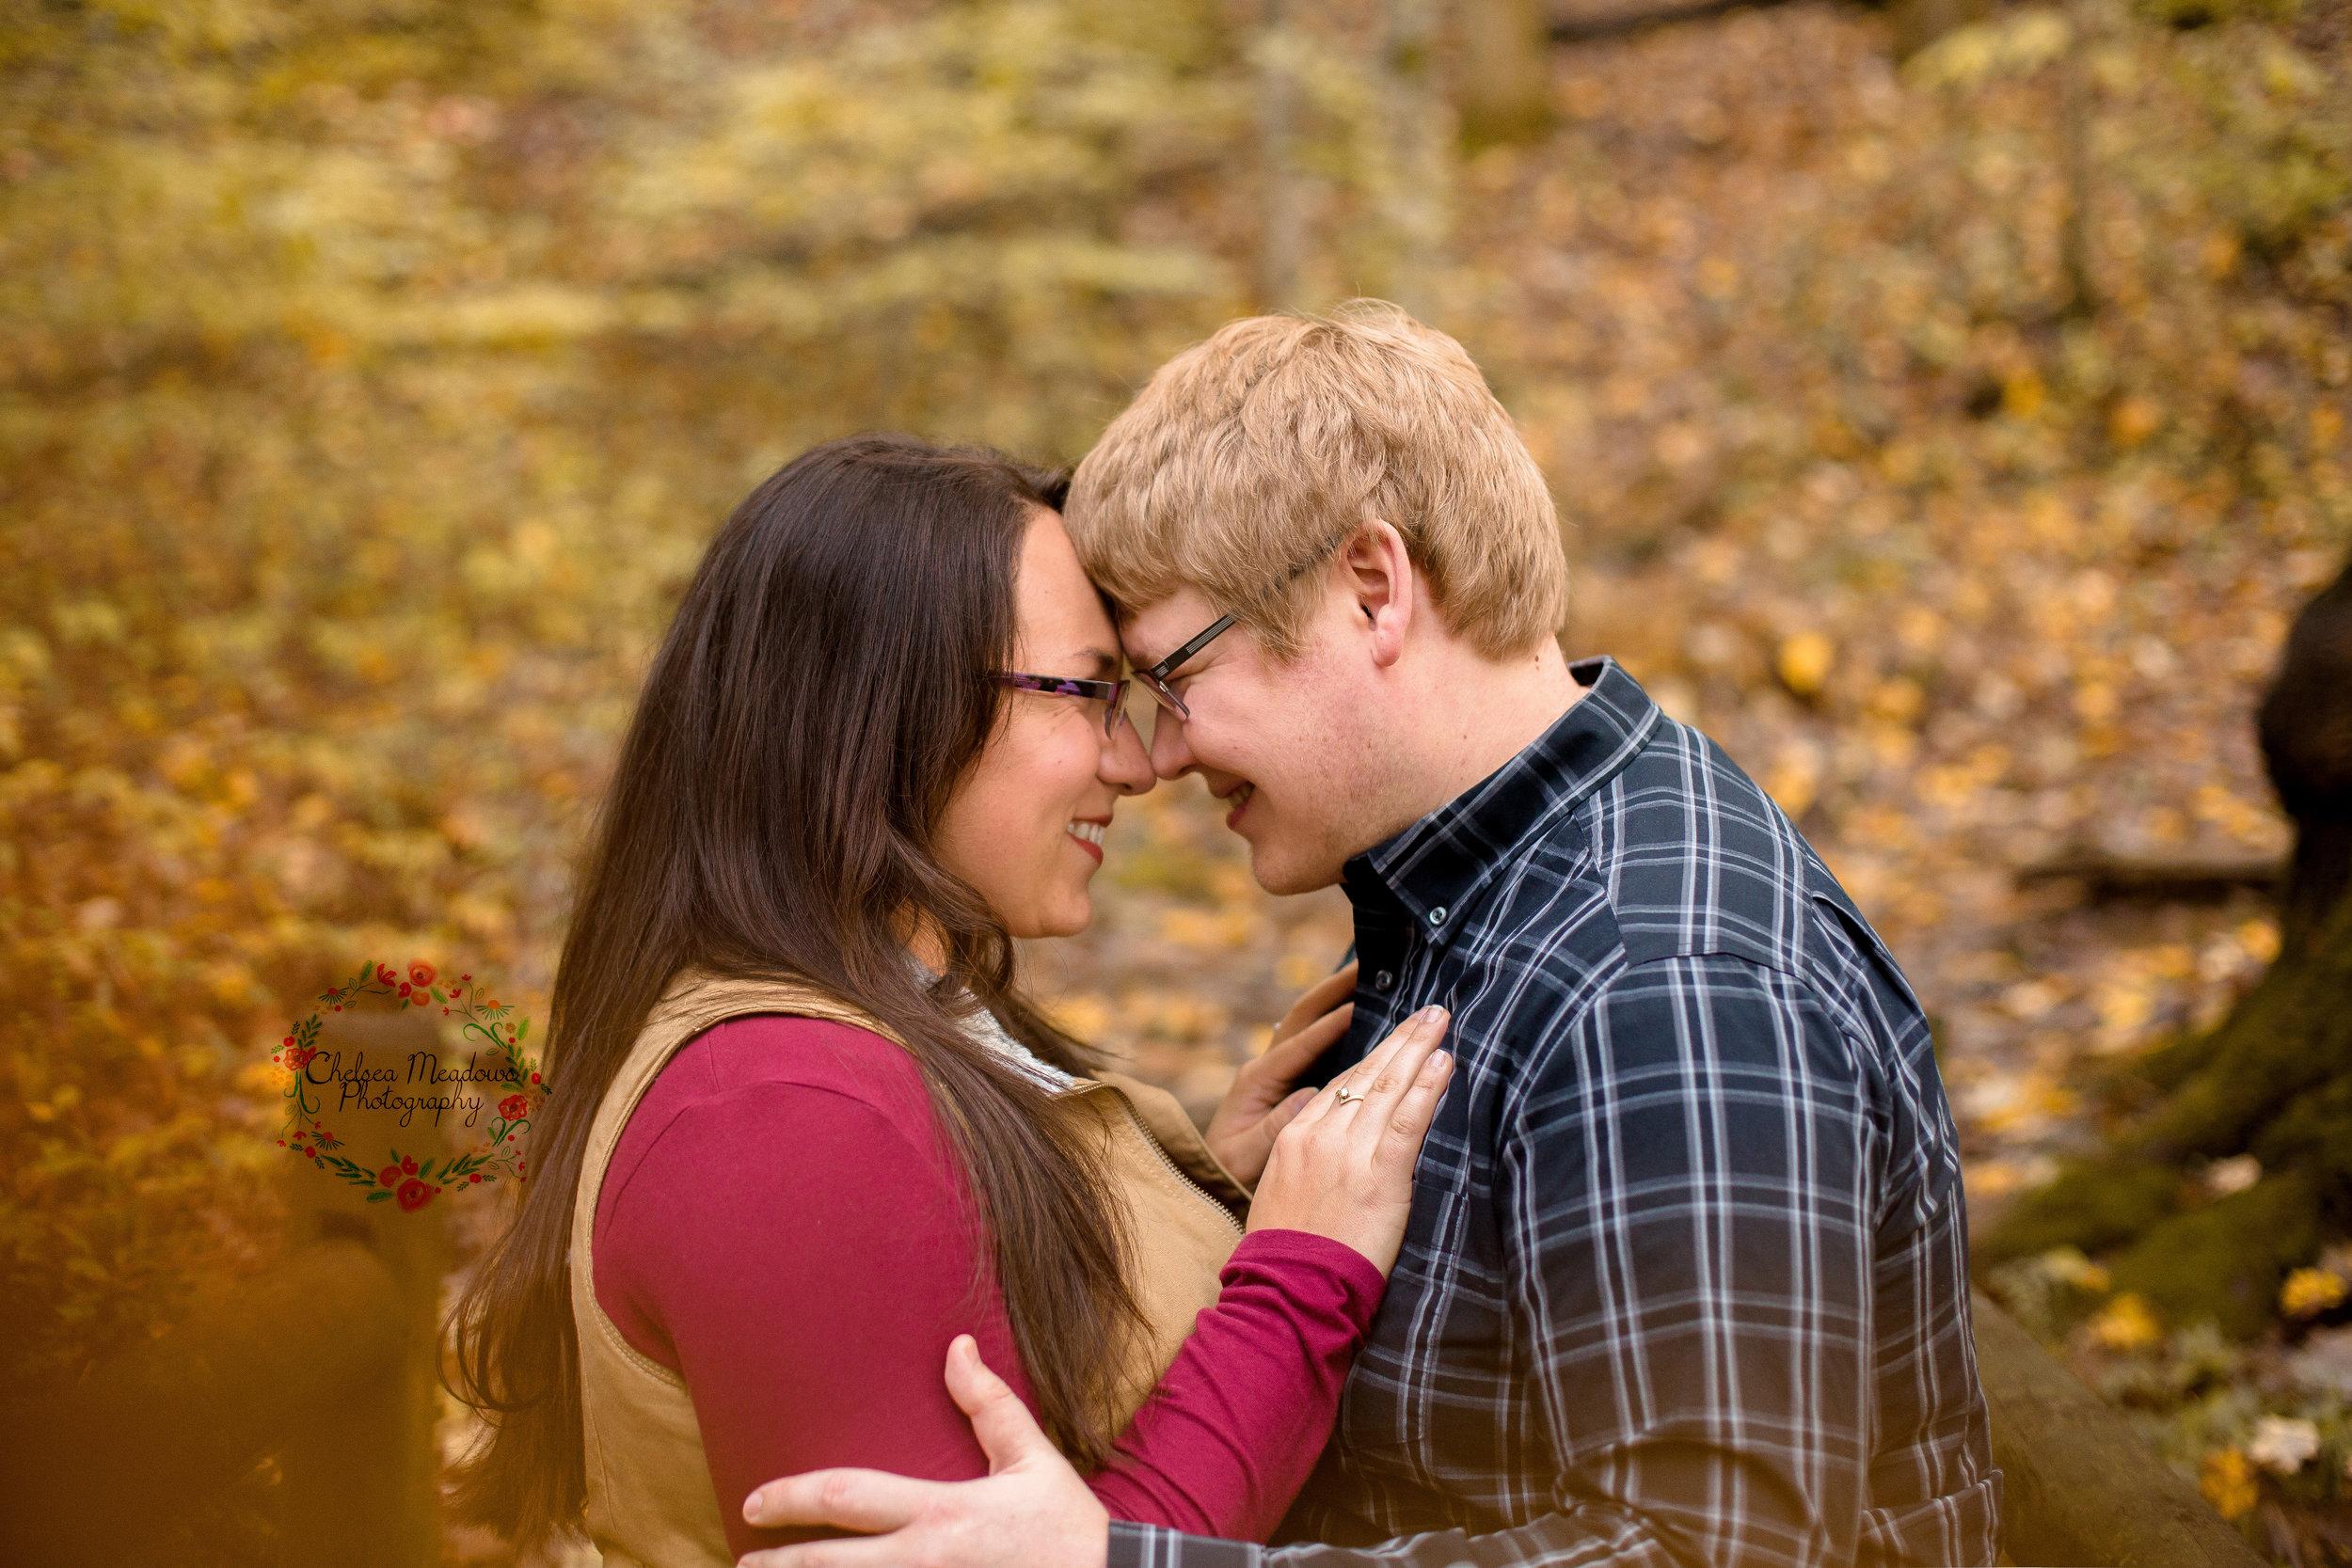 Ashley & Alex Engagement Session - Nashville Couple Photographer - Chelsea Meadows Photography (23).jpg